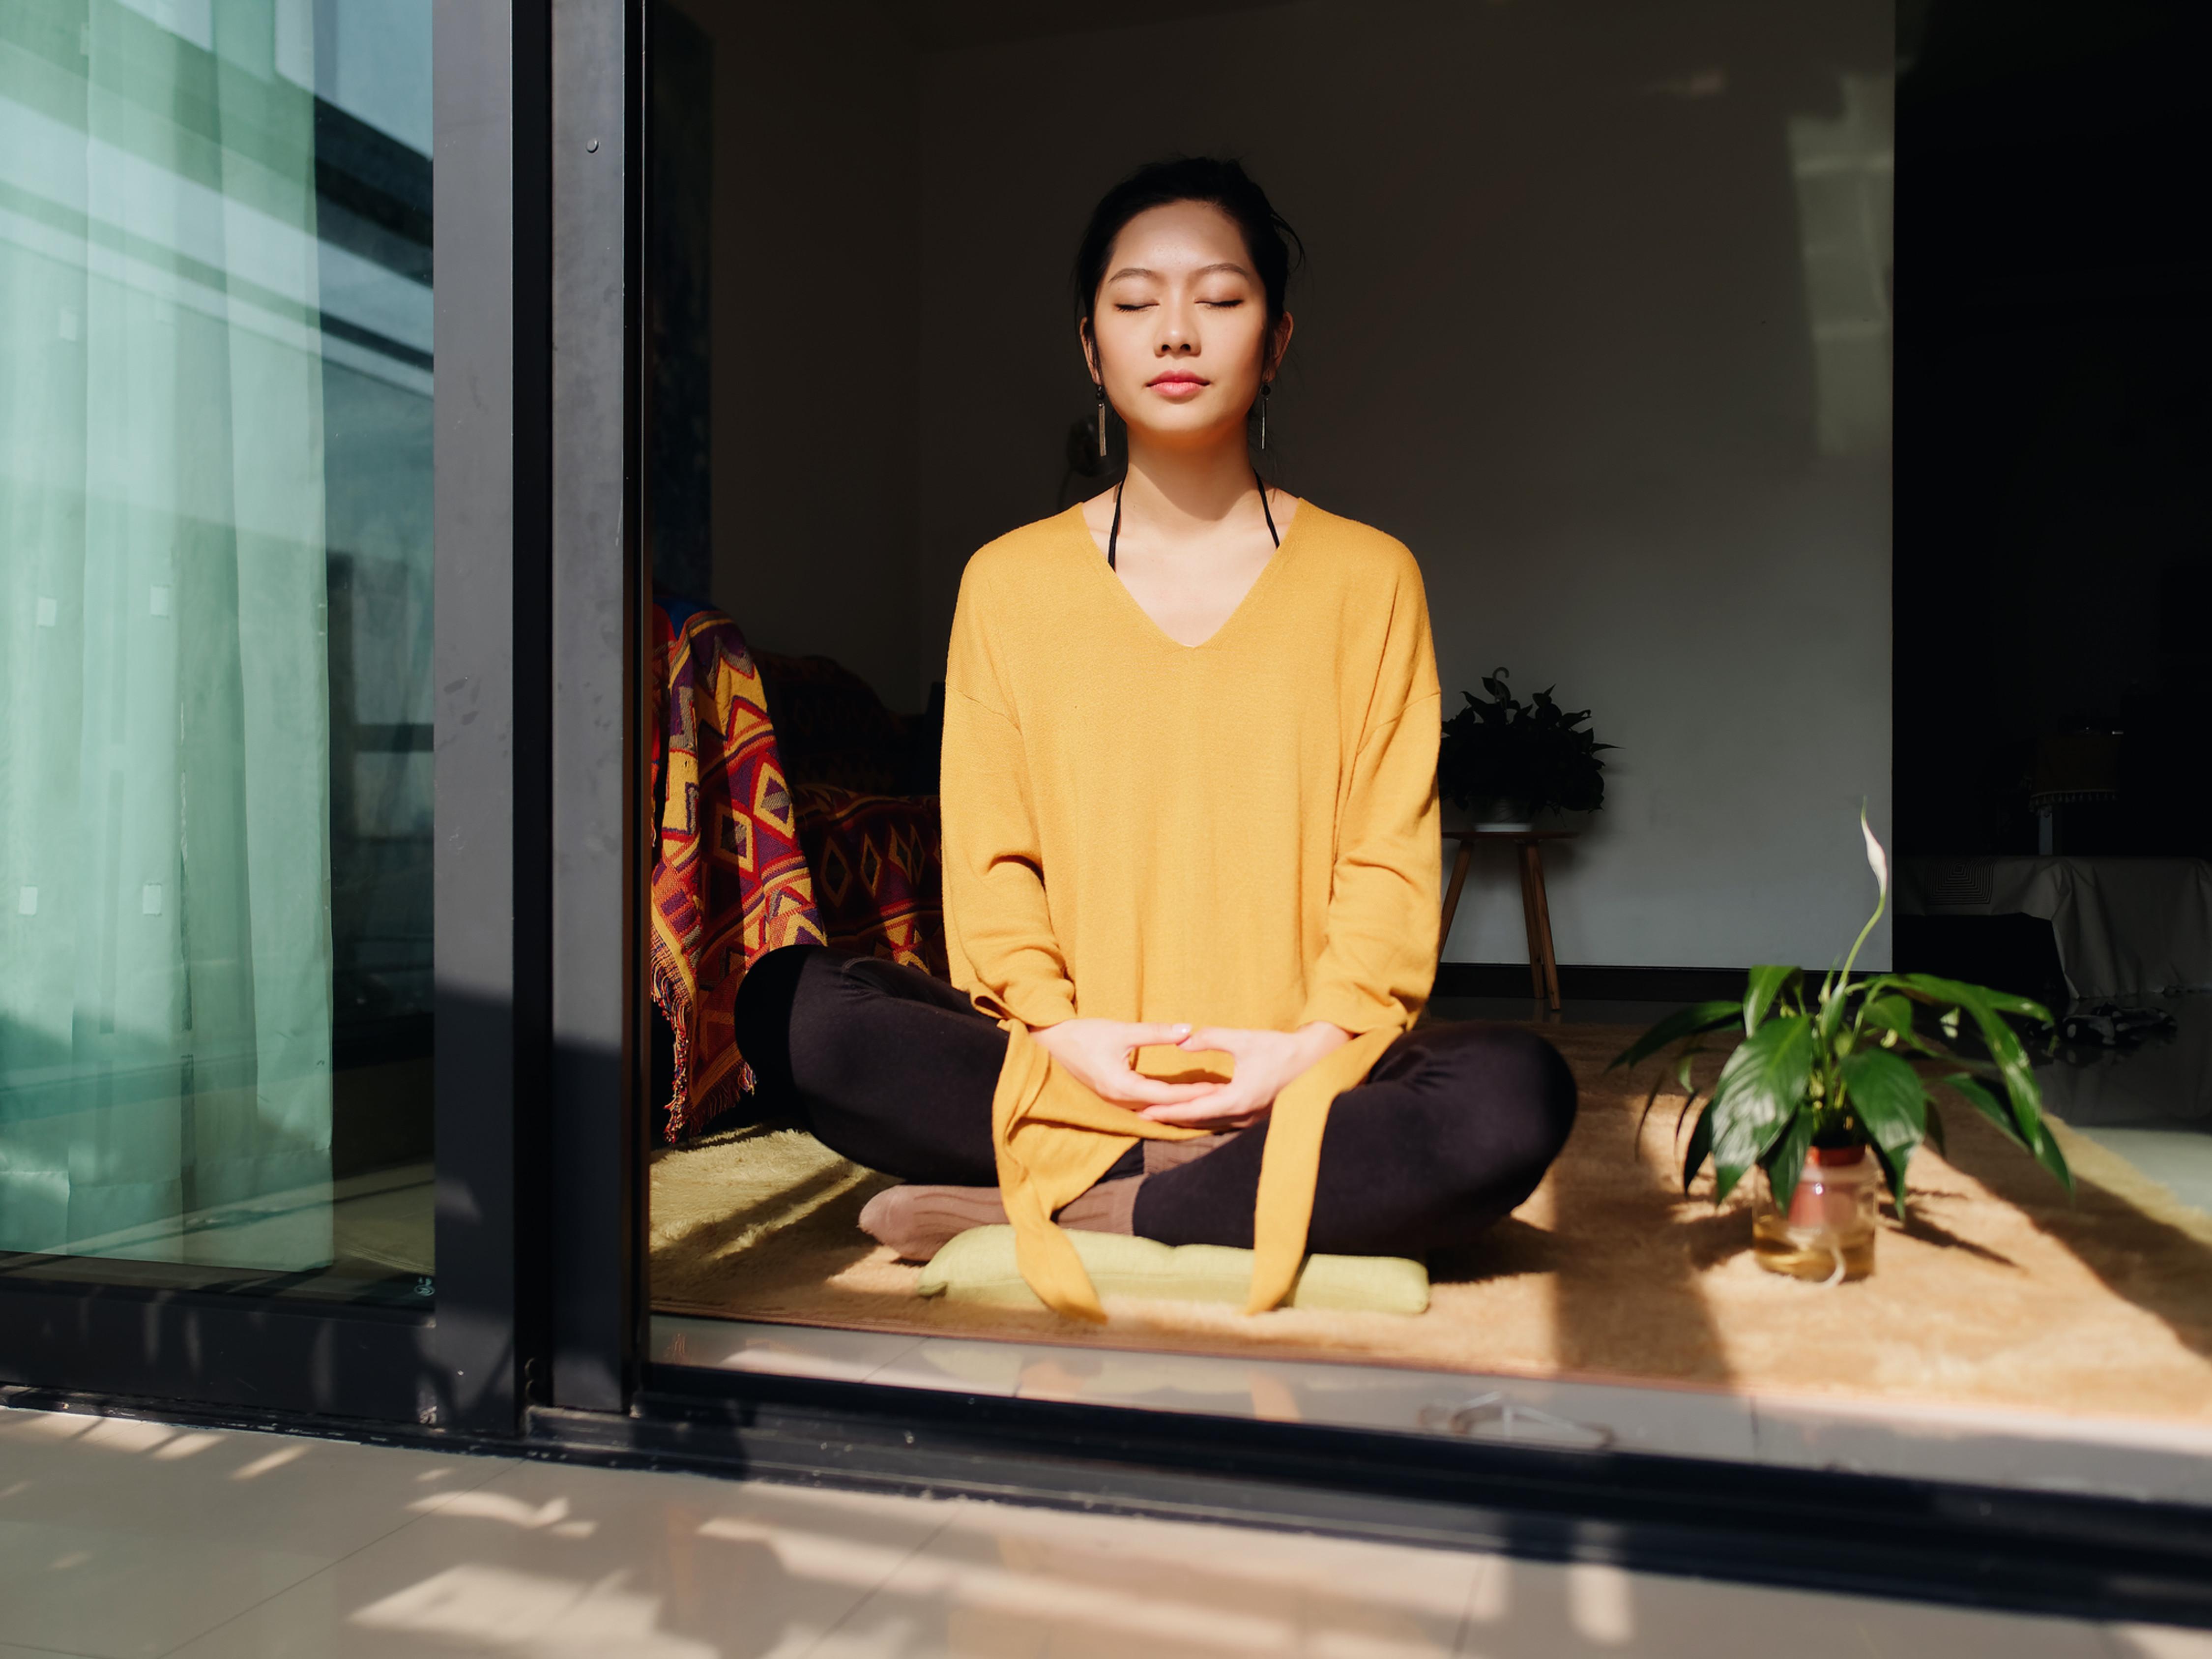 Develop an Advanced Meditation practice